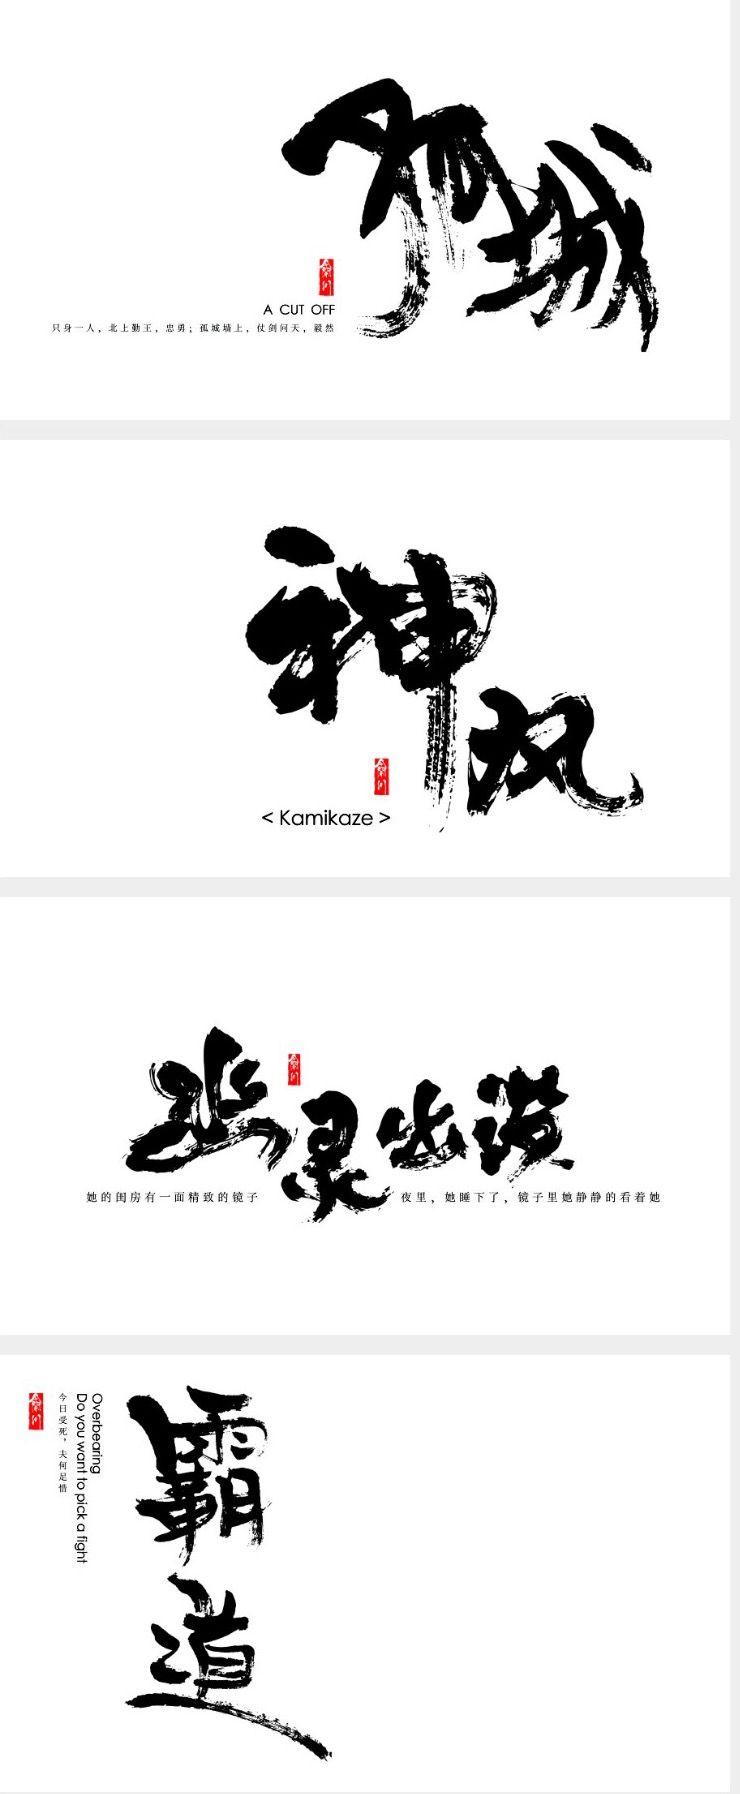 Pin by 痞格 吳 on [中文/漢字/Chinese] | Logos design,免費站標設計,支援中文顯示,文字,顏色, Logos